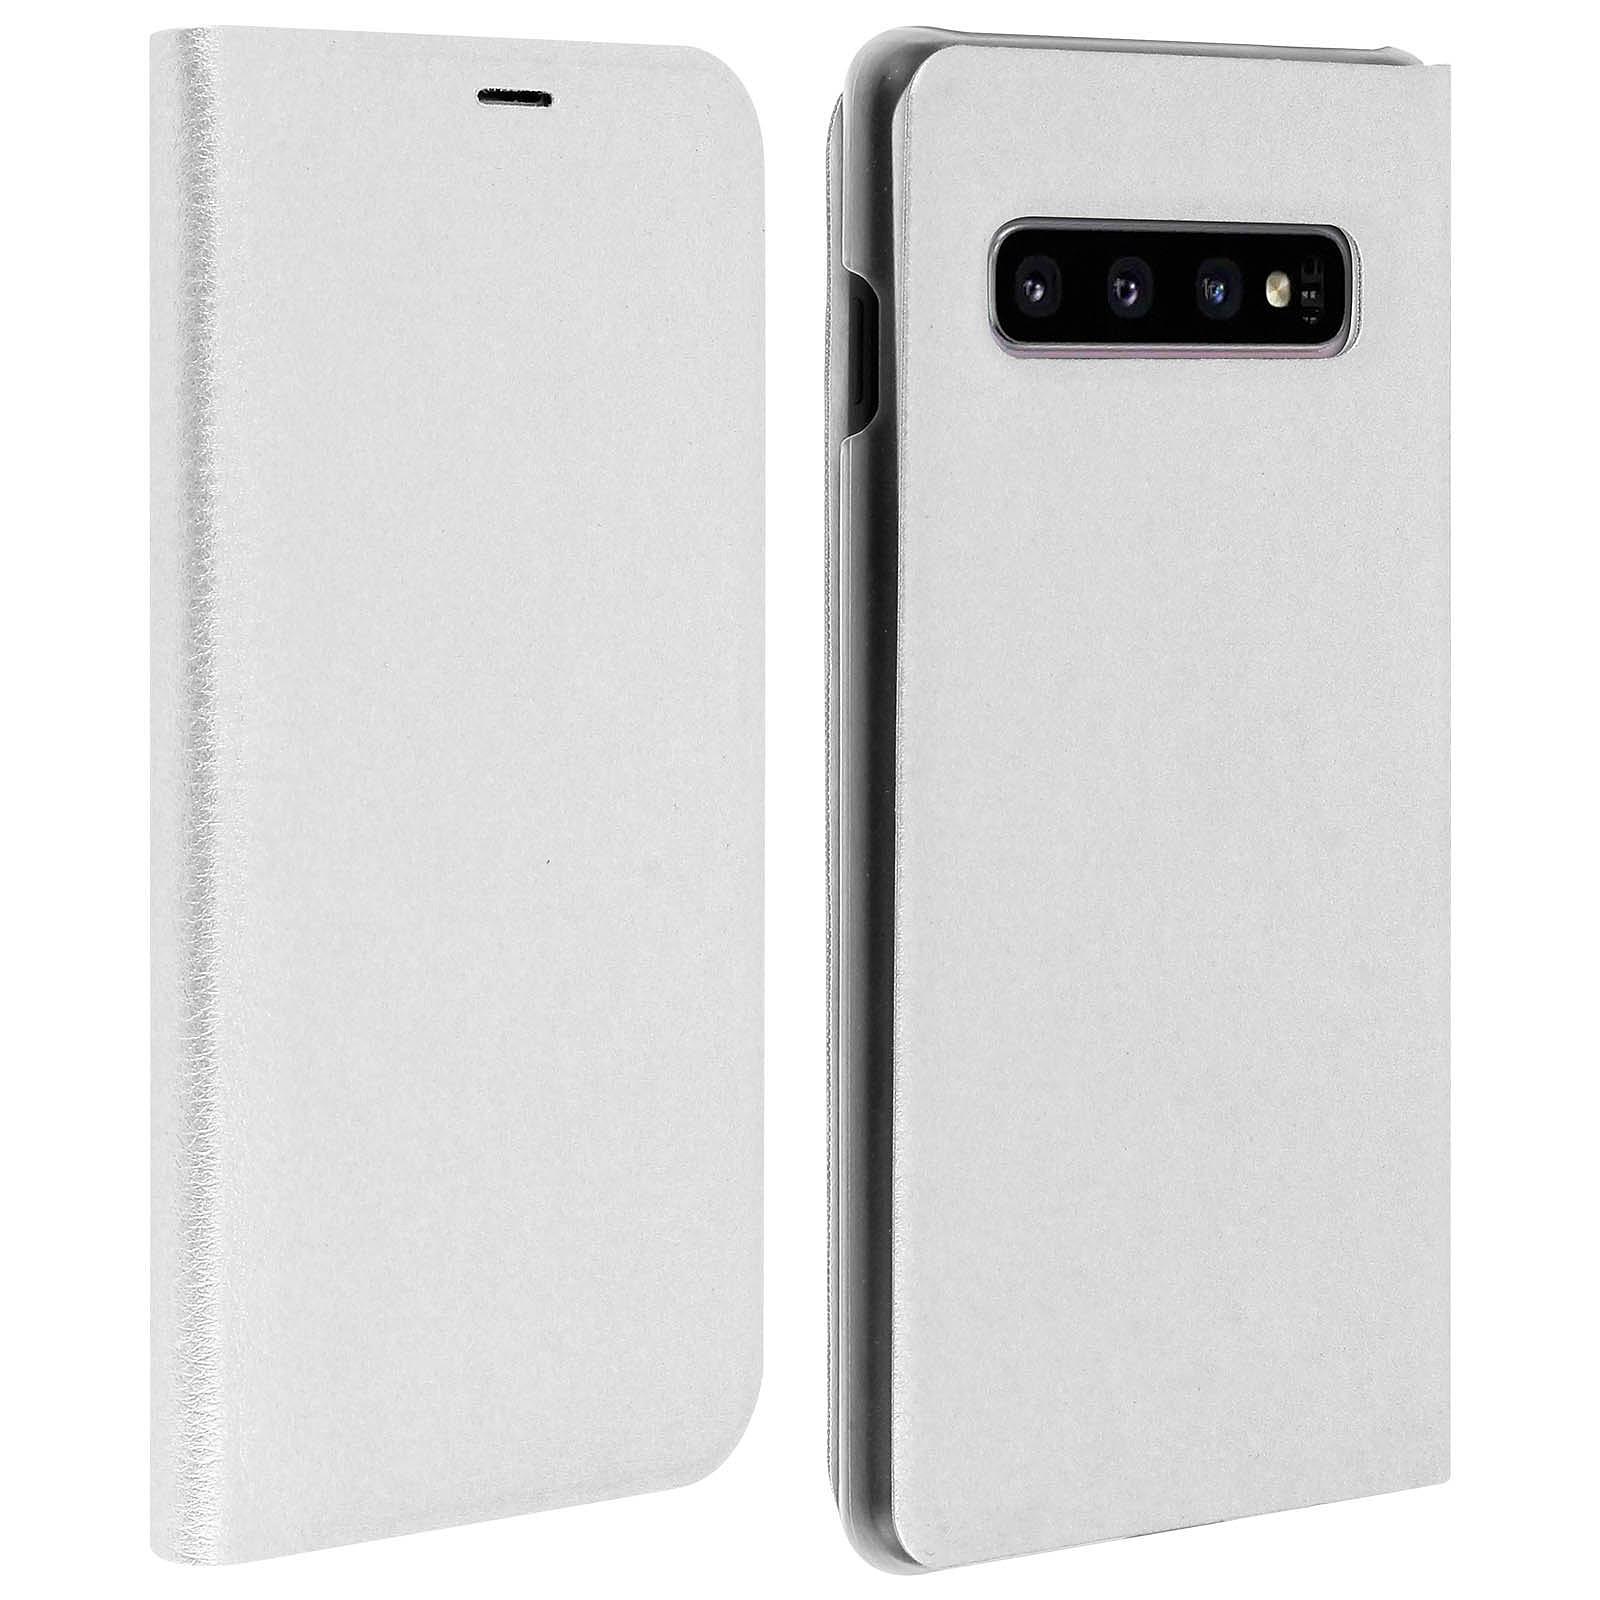 Avizar Etui folio Blanc pour Samsung Galaxy S10 Plus